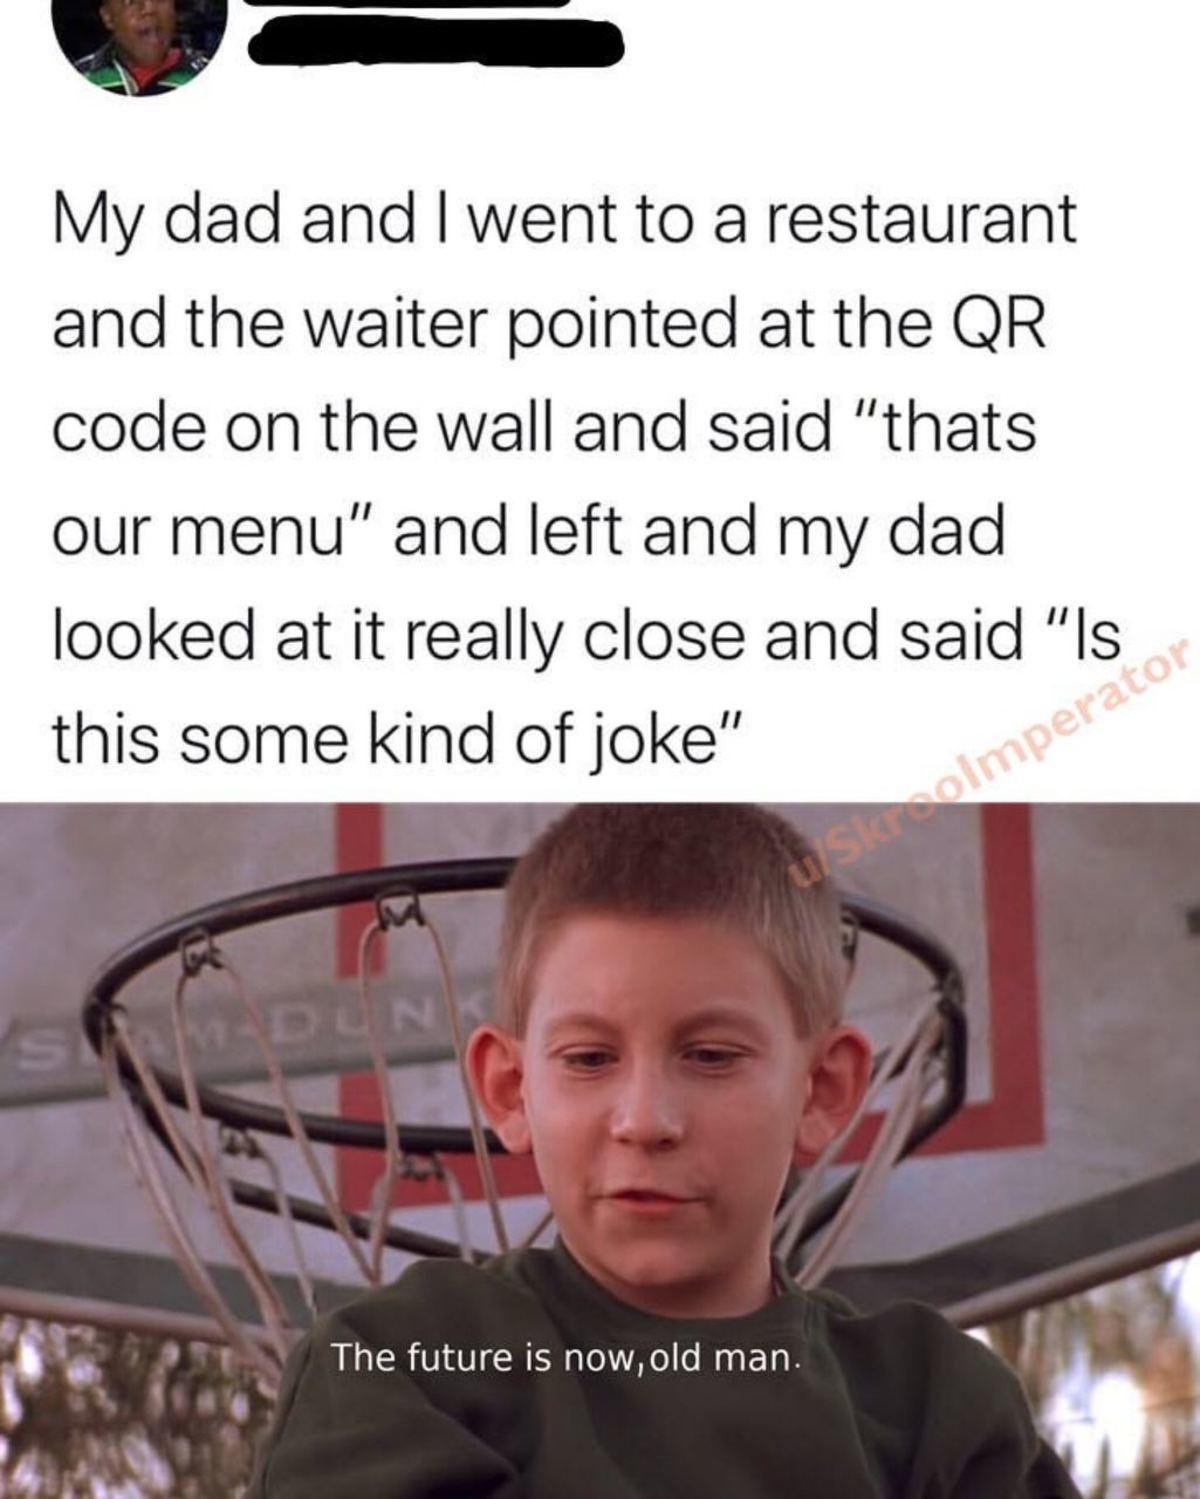 enlivened axiomatic silky Kookabura. .. Qr code is retarded. Give me a menu you millenial faggot